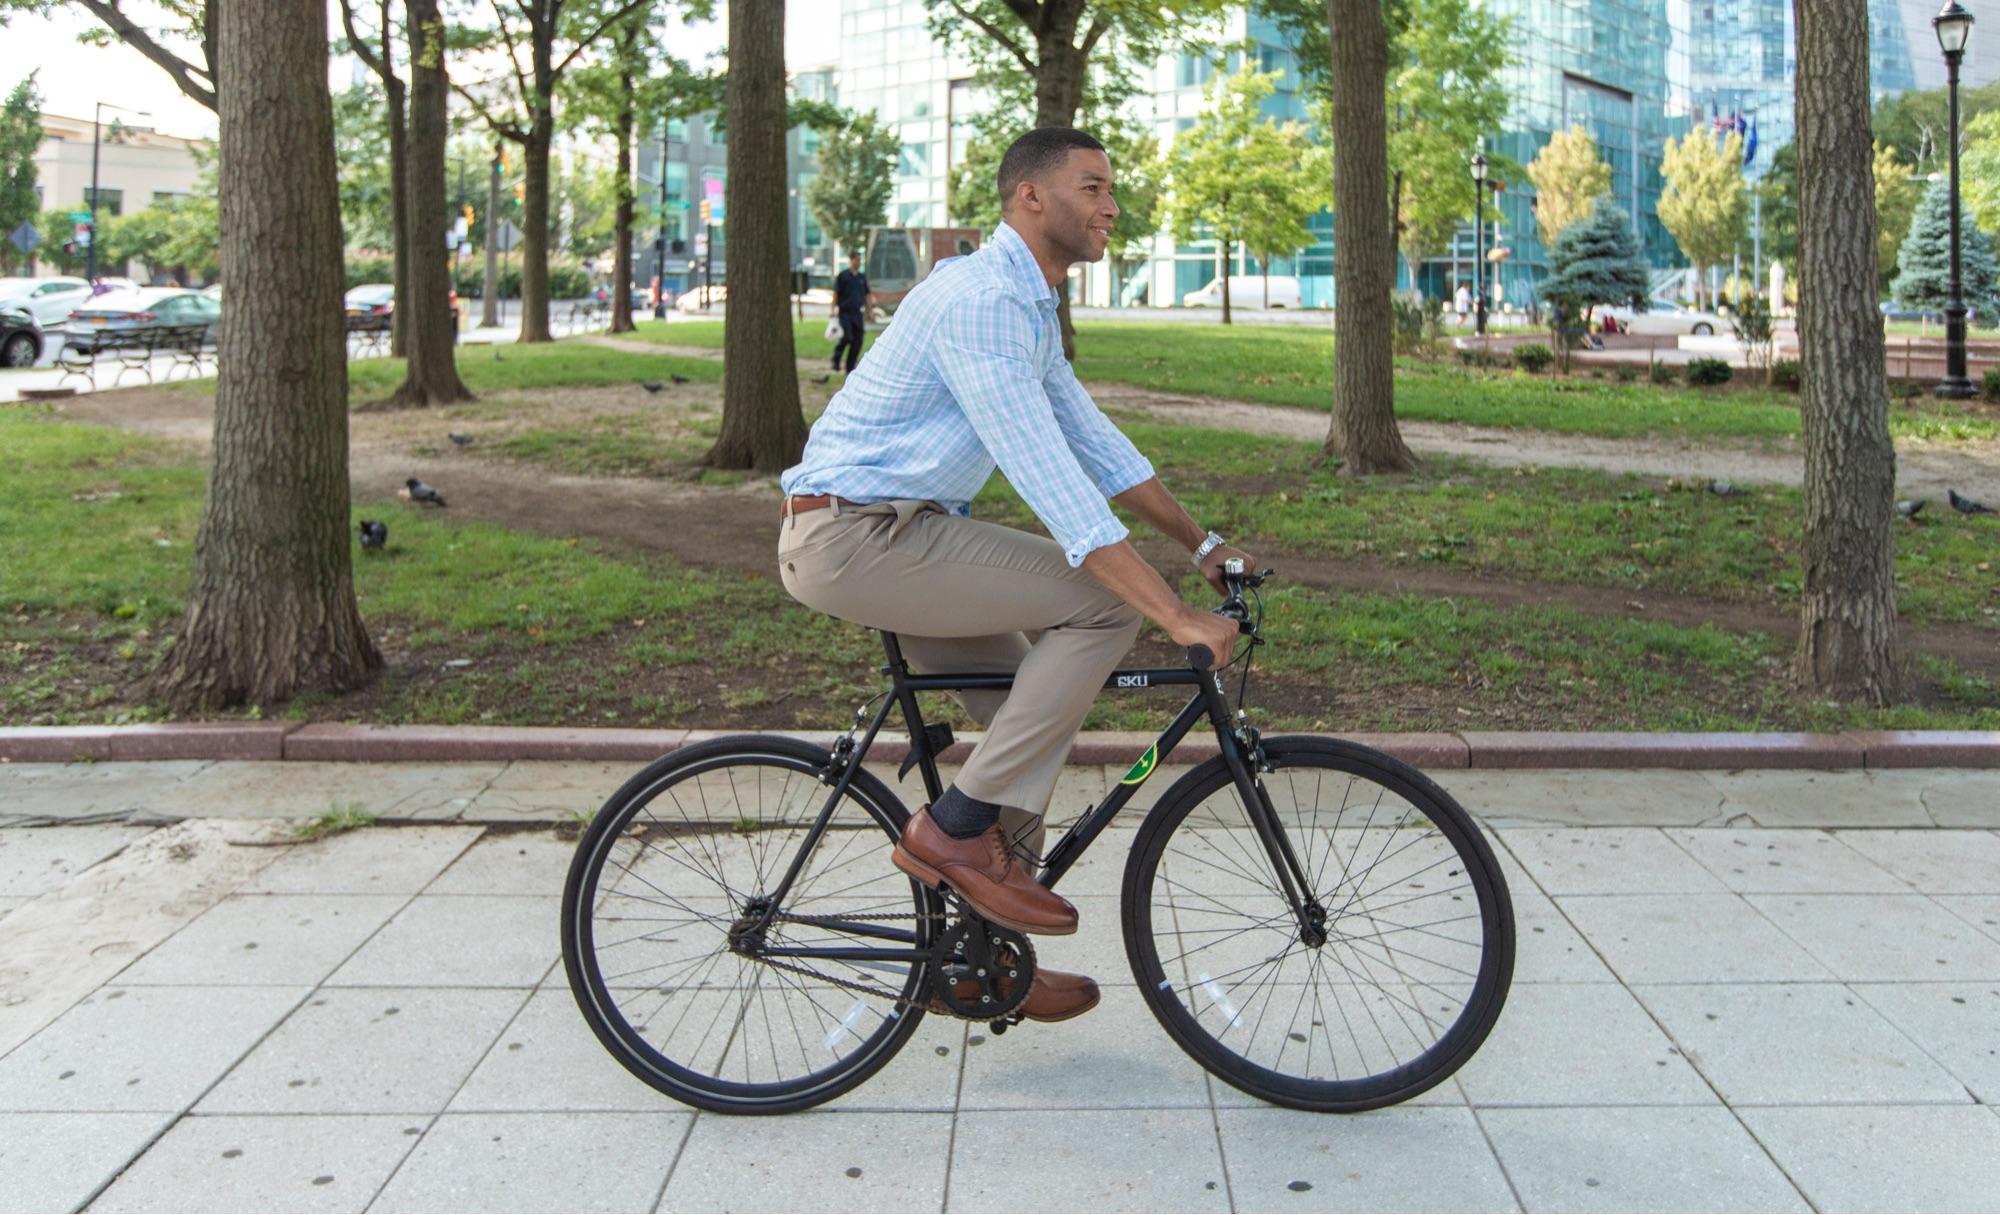 An African-American man in business attire rides a bike through an NYC neighborhood